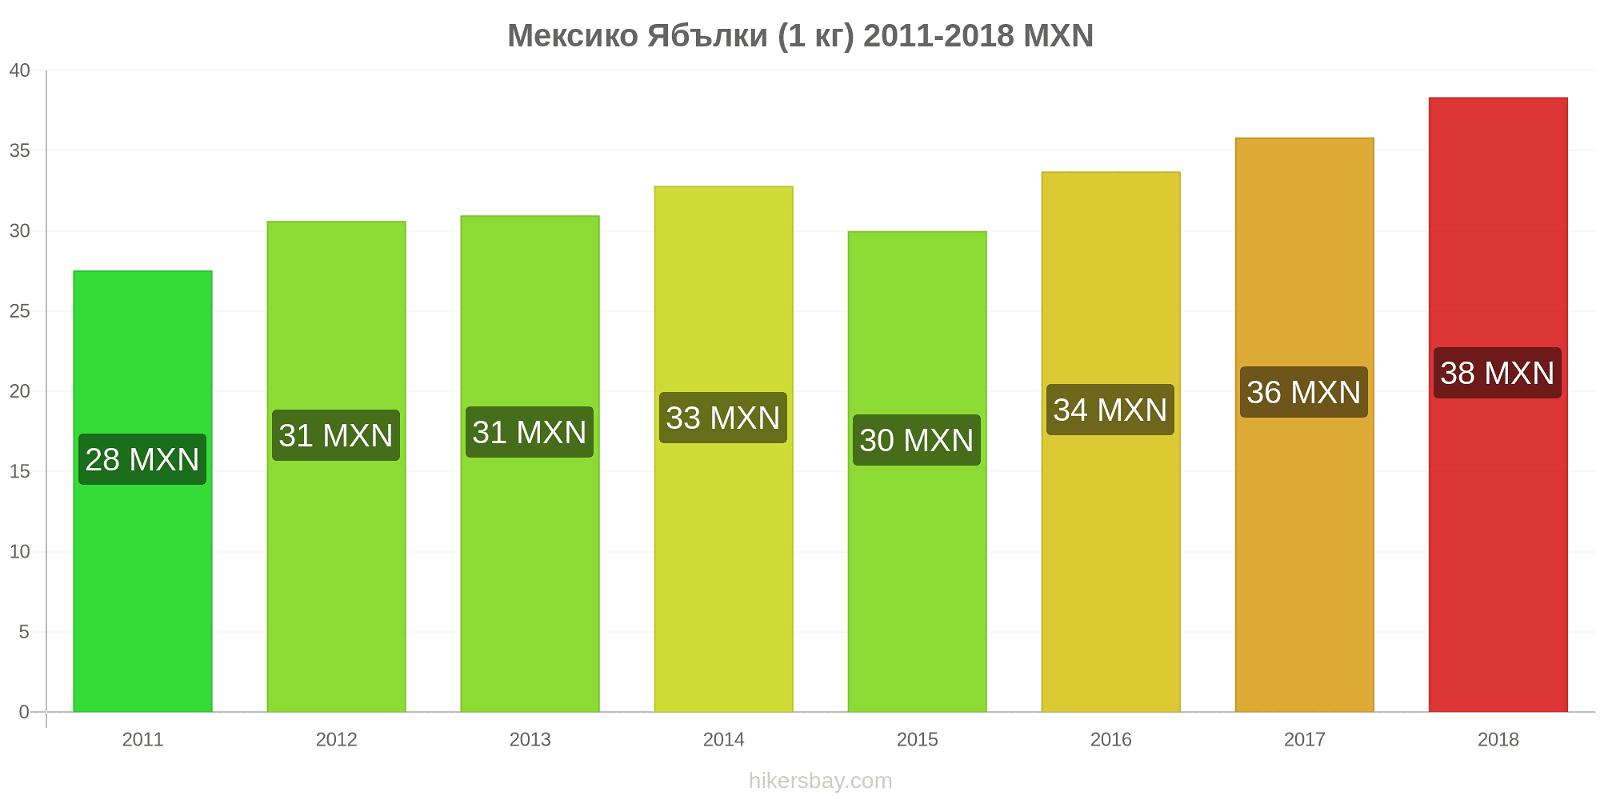 Мексико ценови промени Ябълки (1 кг) hikersbay.com